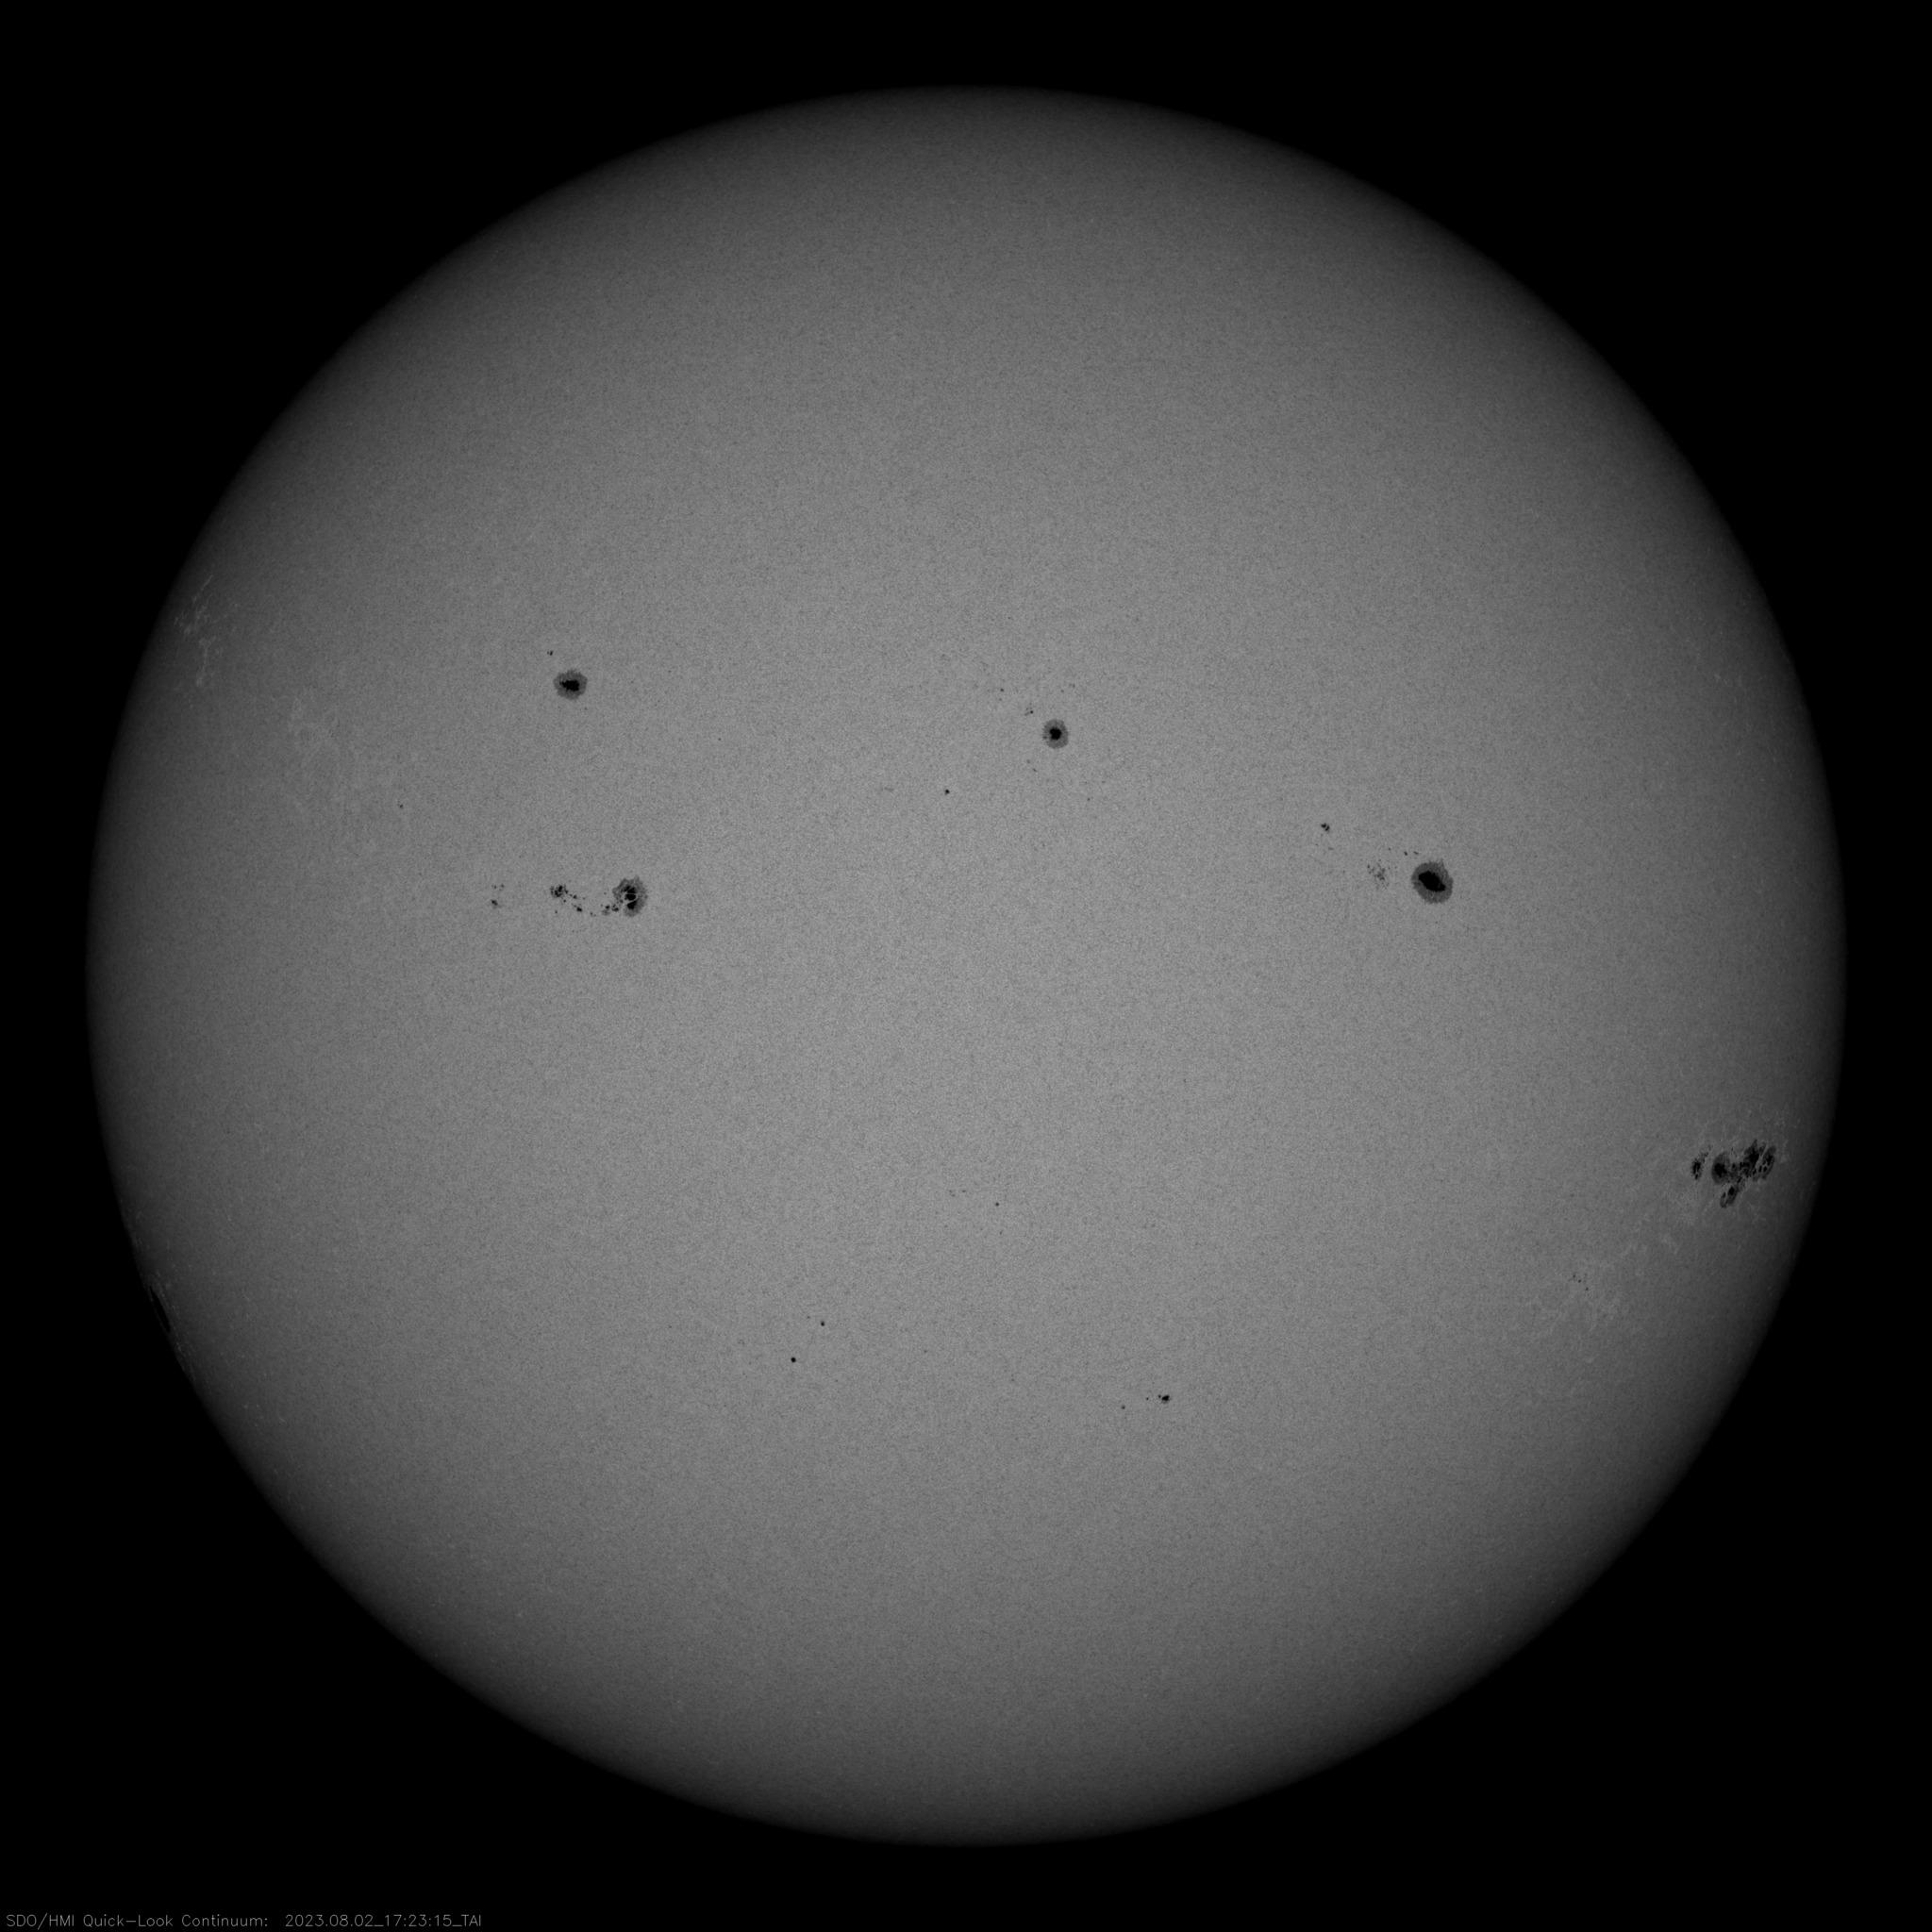 Conteo de Manchas solares